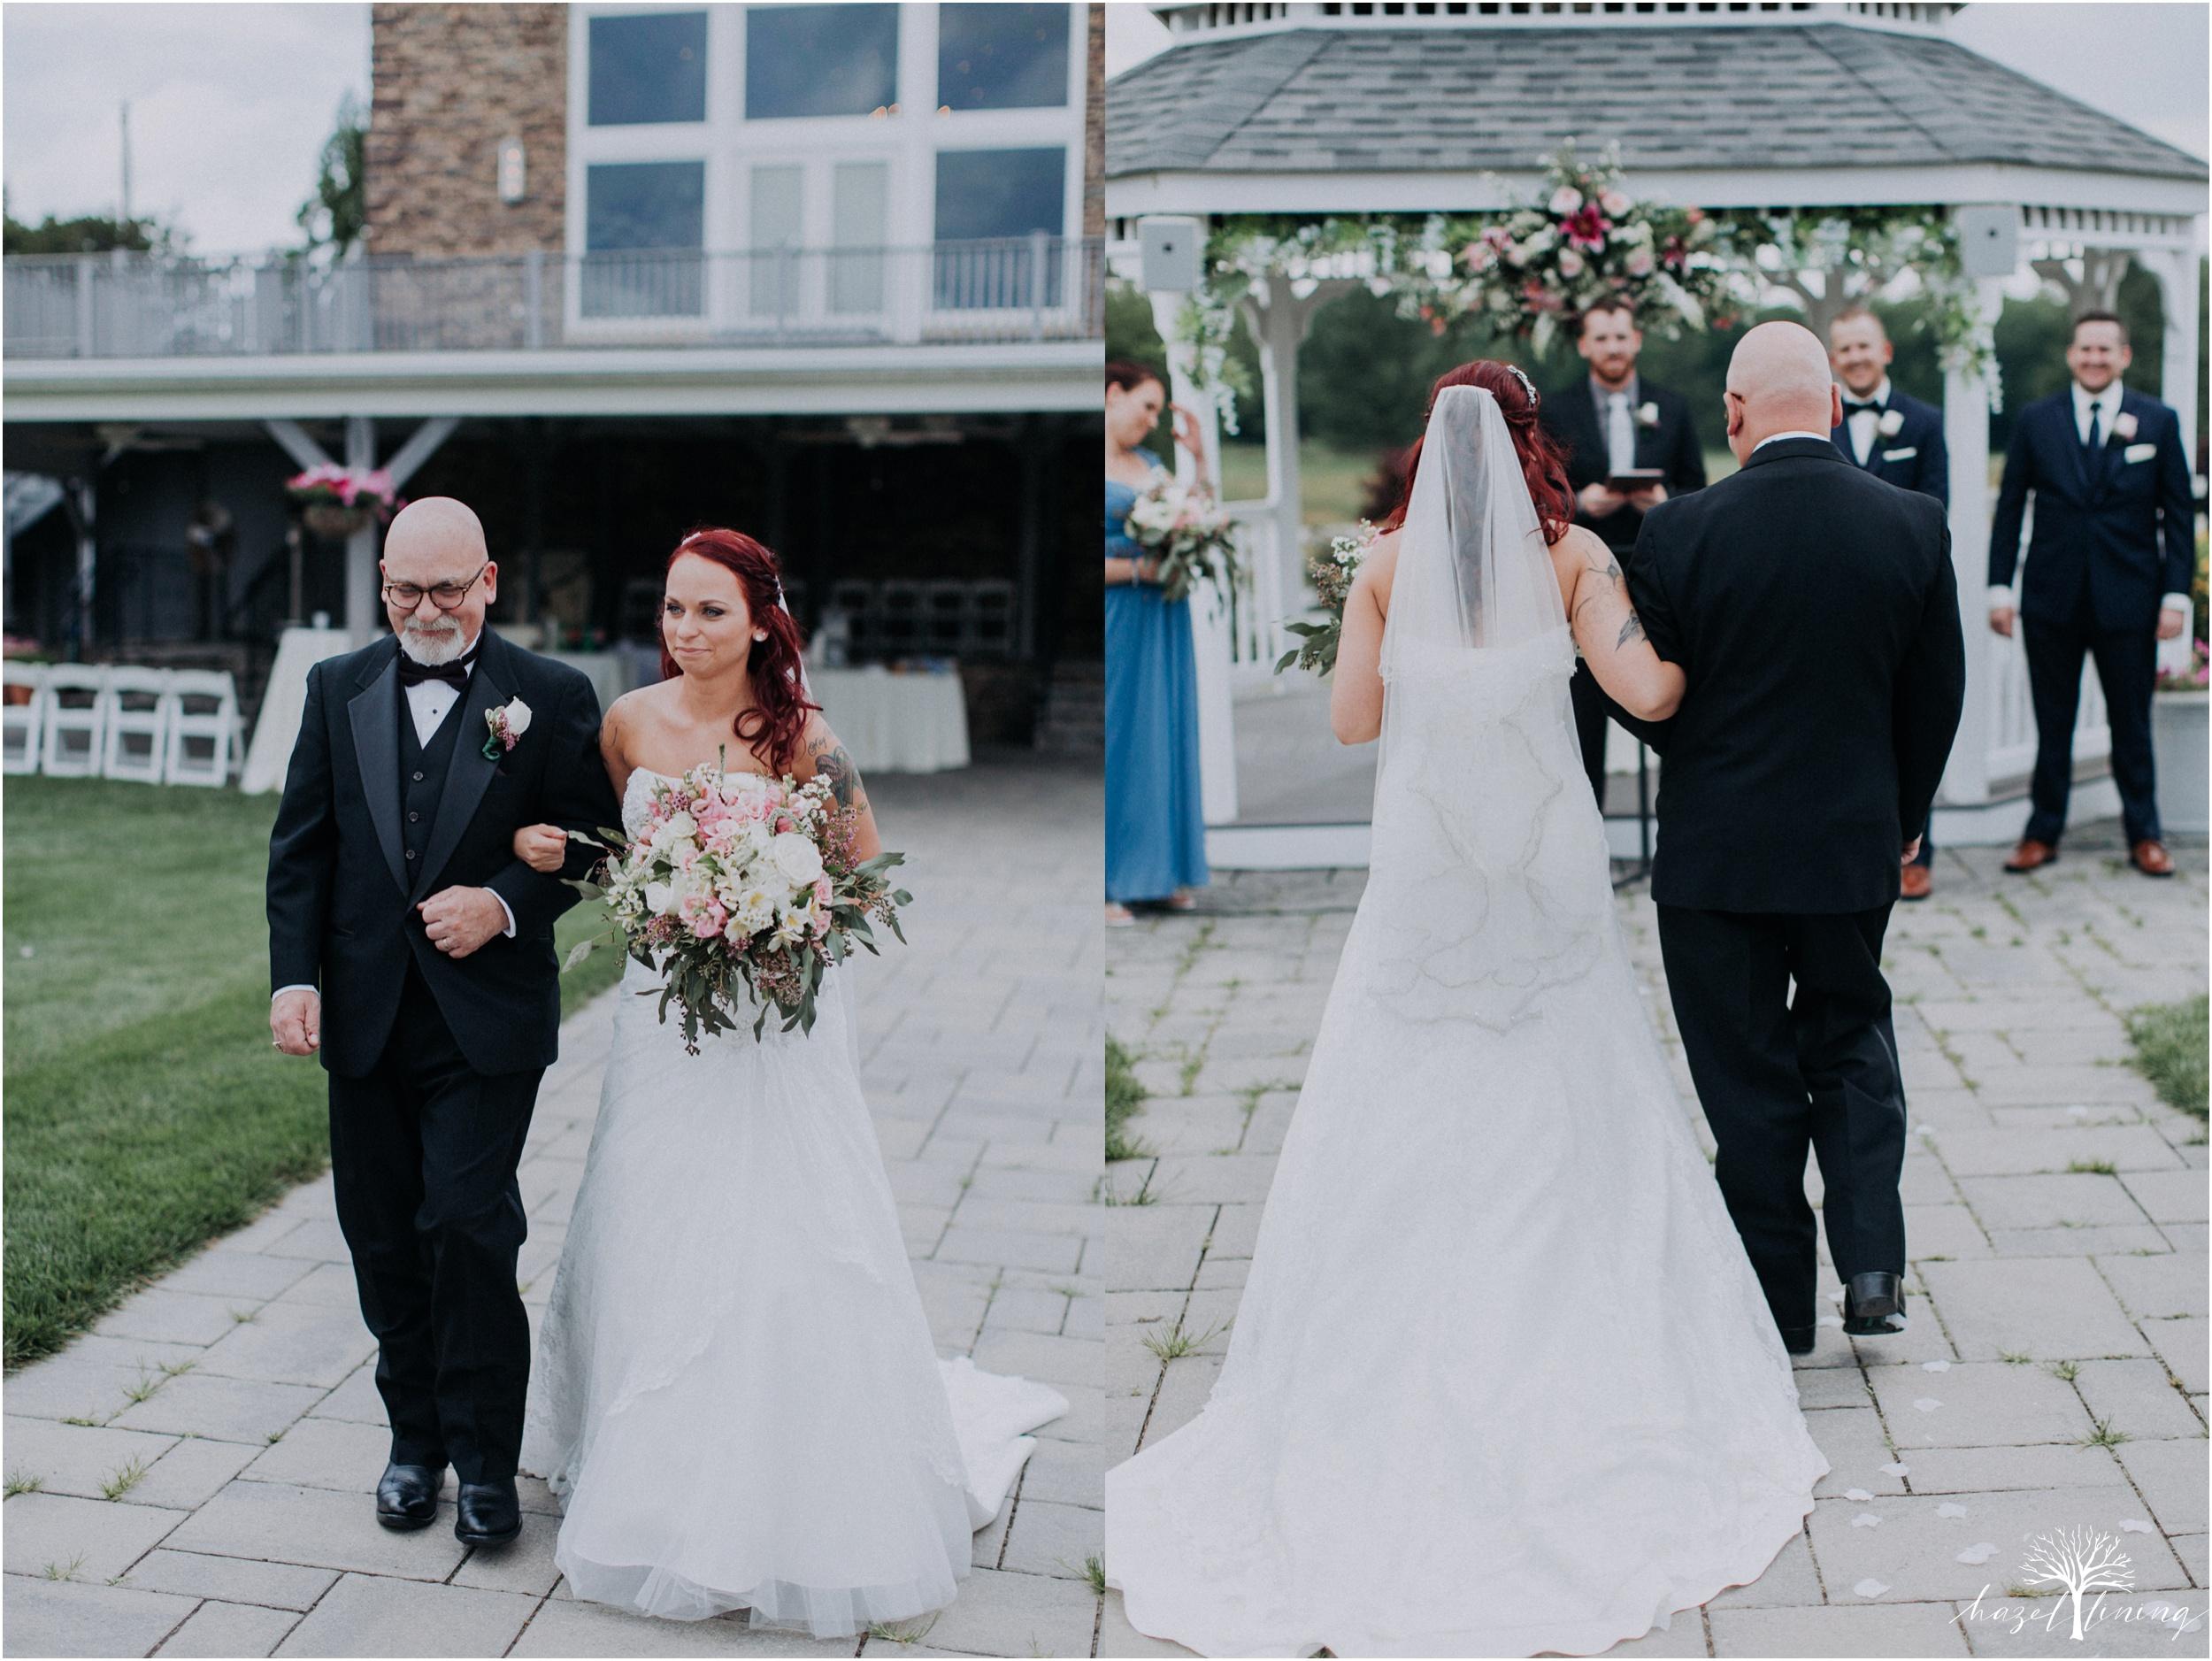 alyssa-james-stiteler-wedding-loft-and-sweet-water-cc-pennsburg-pennsylvania-hazel-lining-travel-wedding-elopement-photography_0050.jpg